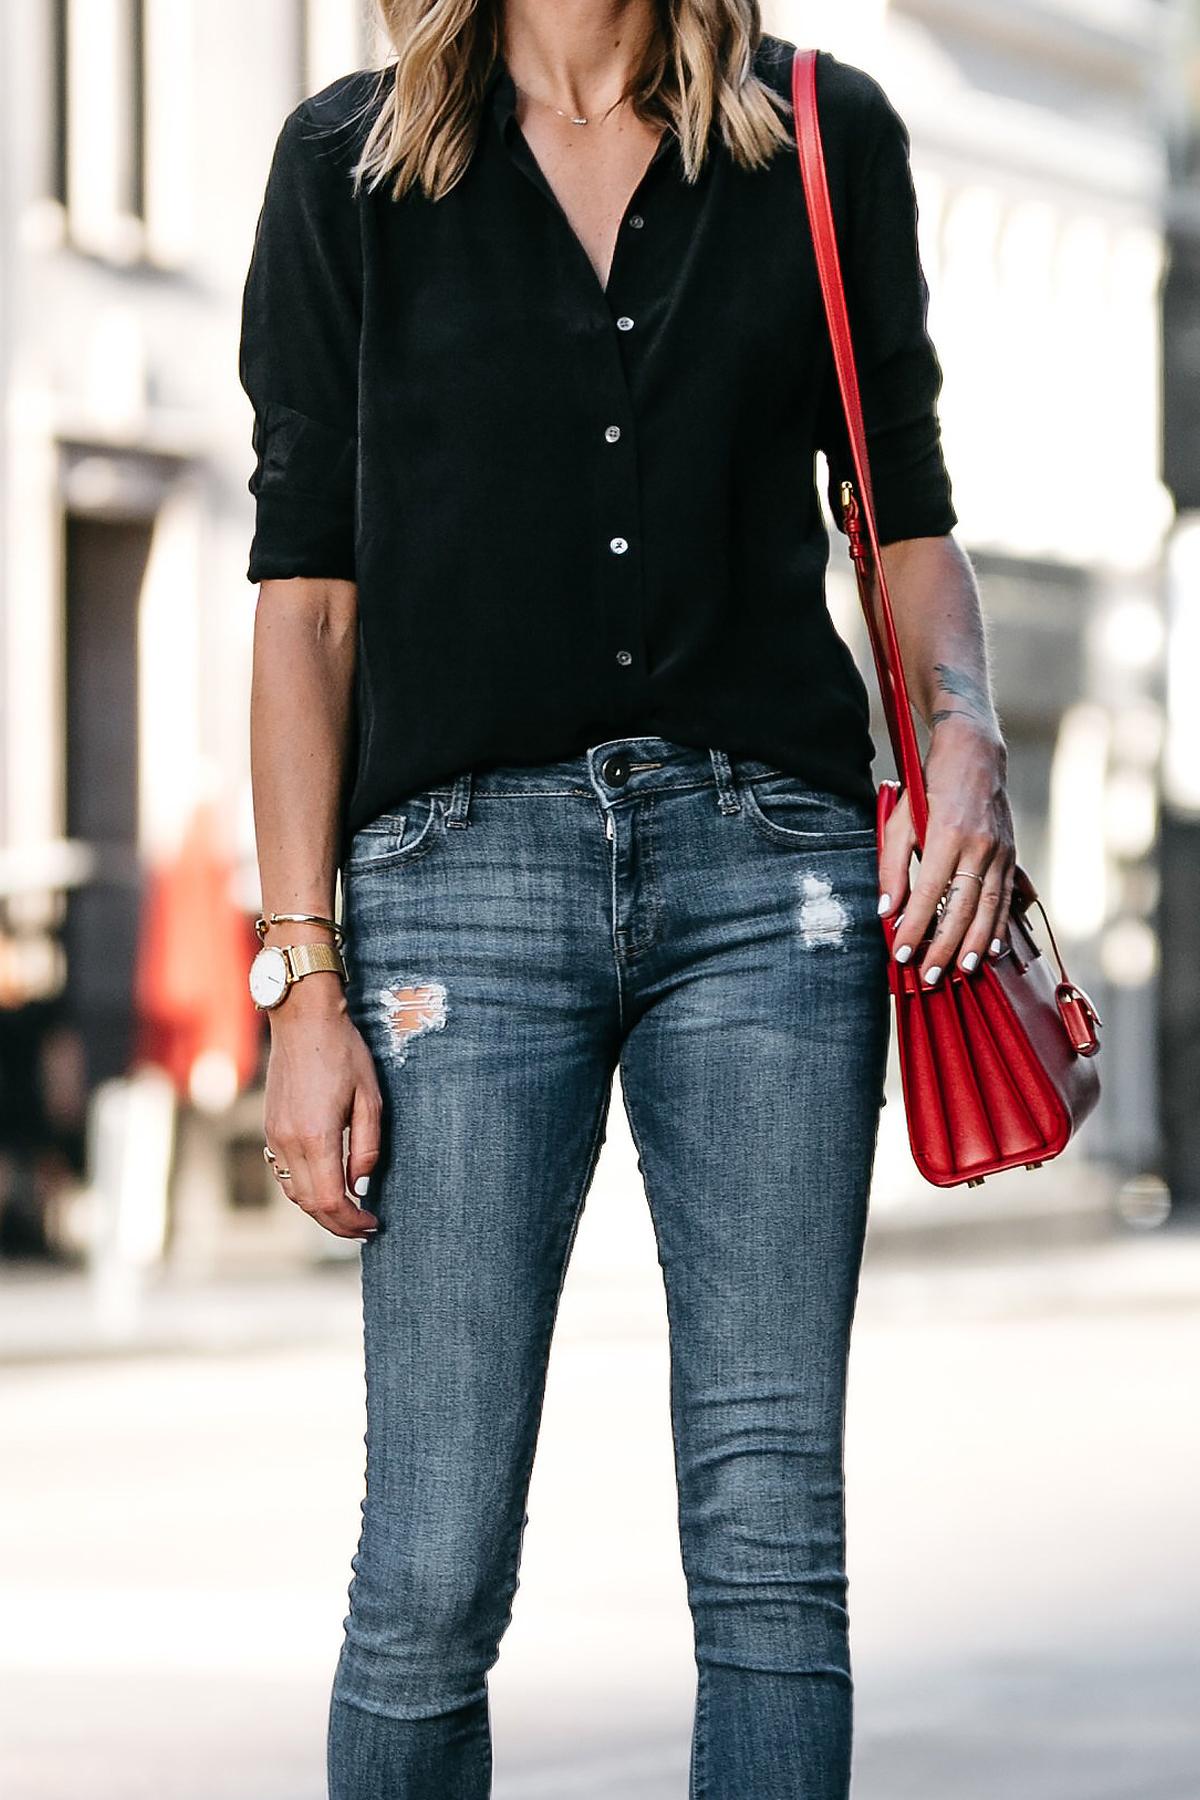 Everlane Black Button Up Shirt Denim Skinny Jeans Red Handbag Fashion Jackson Dallas Blogger Fashion Blogger Street Style